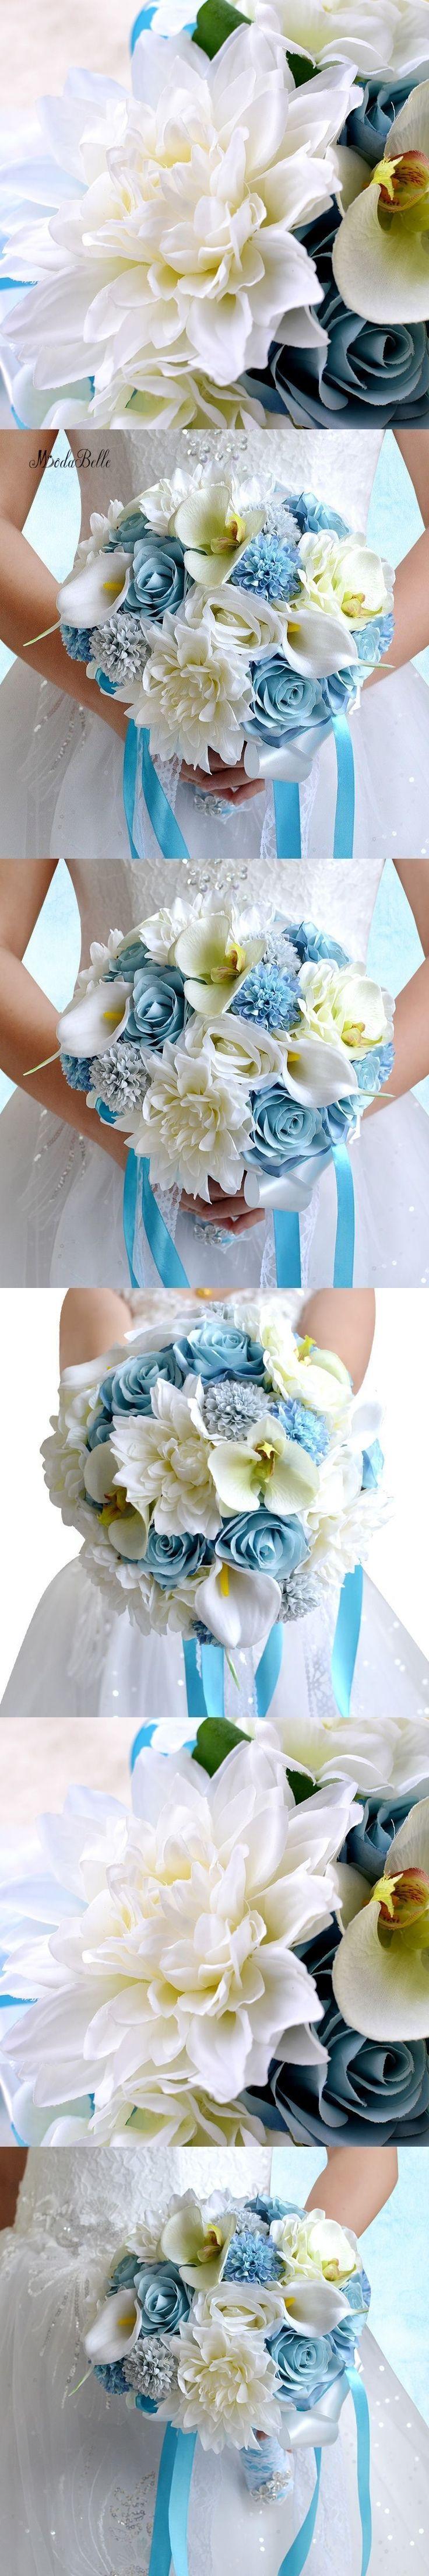 Romantic Blue Roses Beach Wedding Flowers Bouquets Bridal Brooch Bouquets De Mariage Artificial Calla Wedding Bouquet For Brides